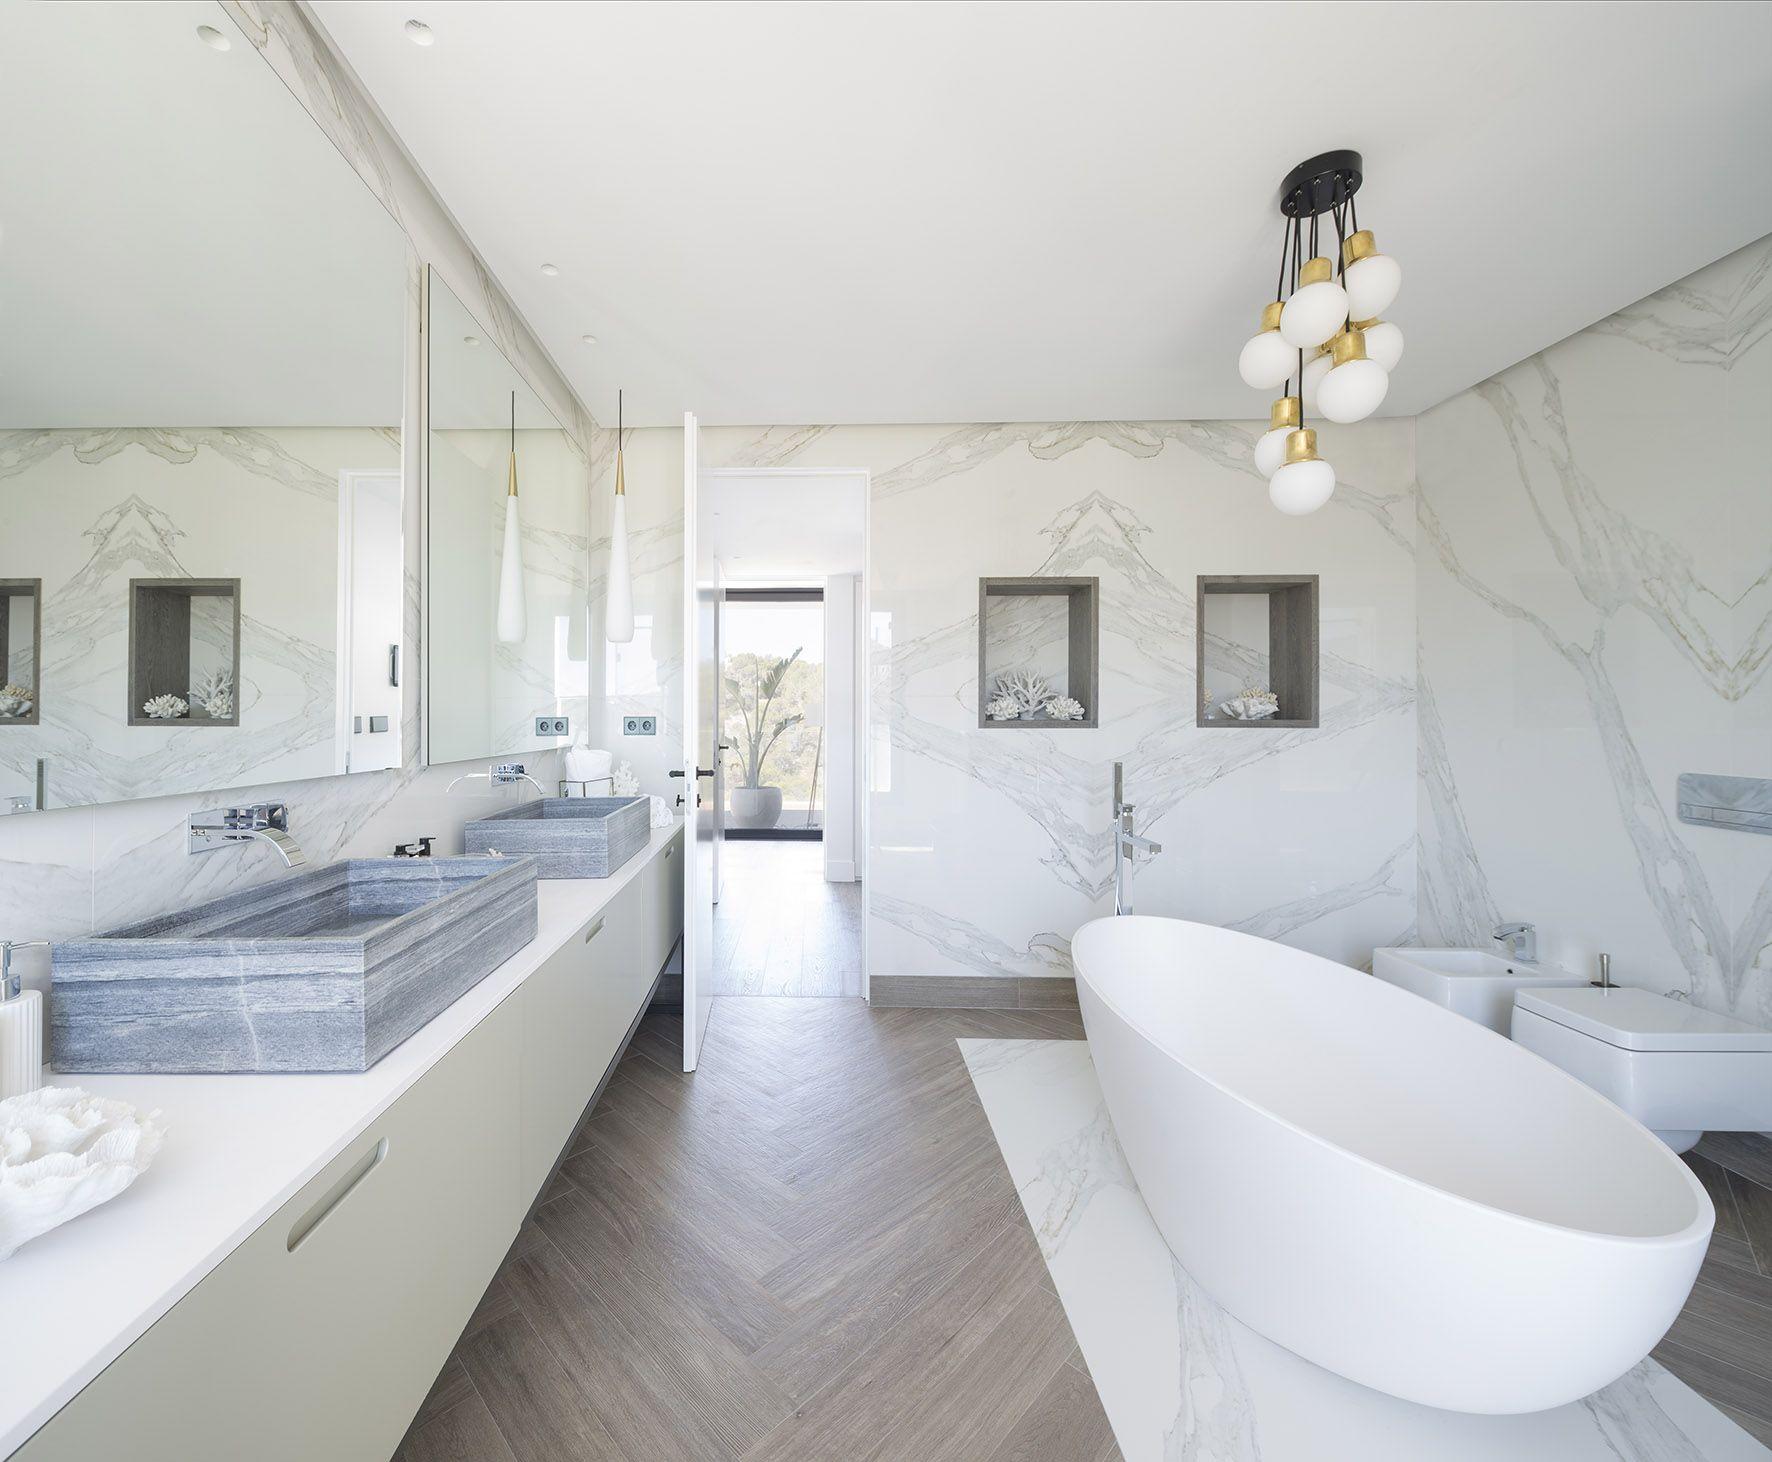 Baño de vivienda en Ibiza, diseñado por Natalia Zubizarreta ...